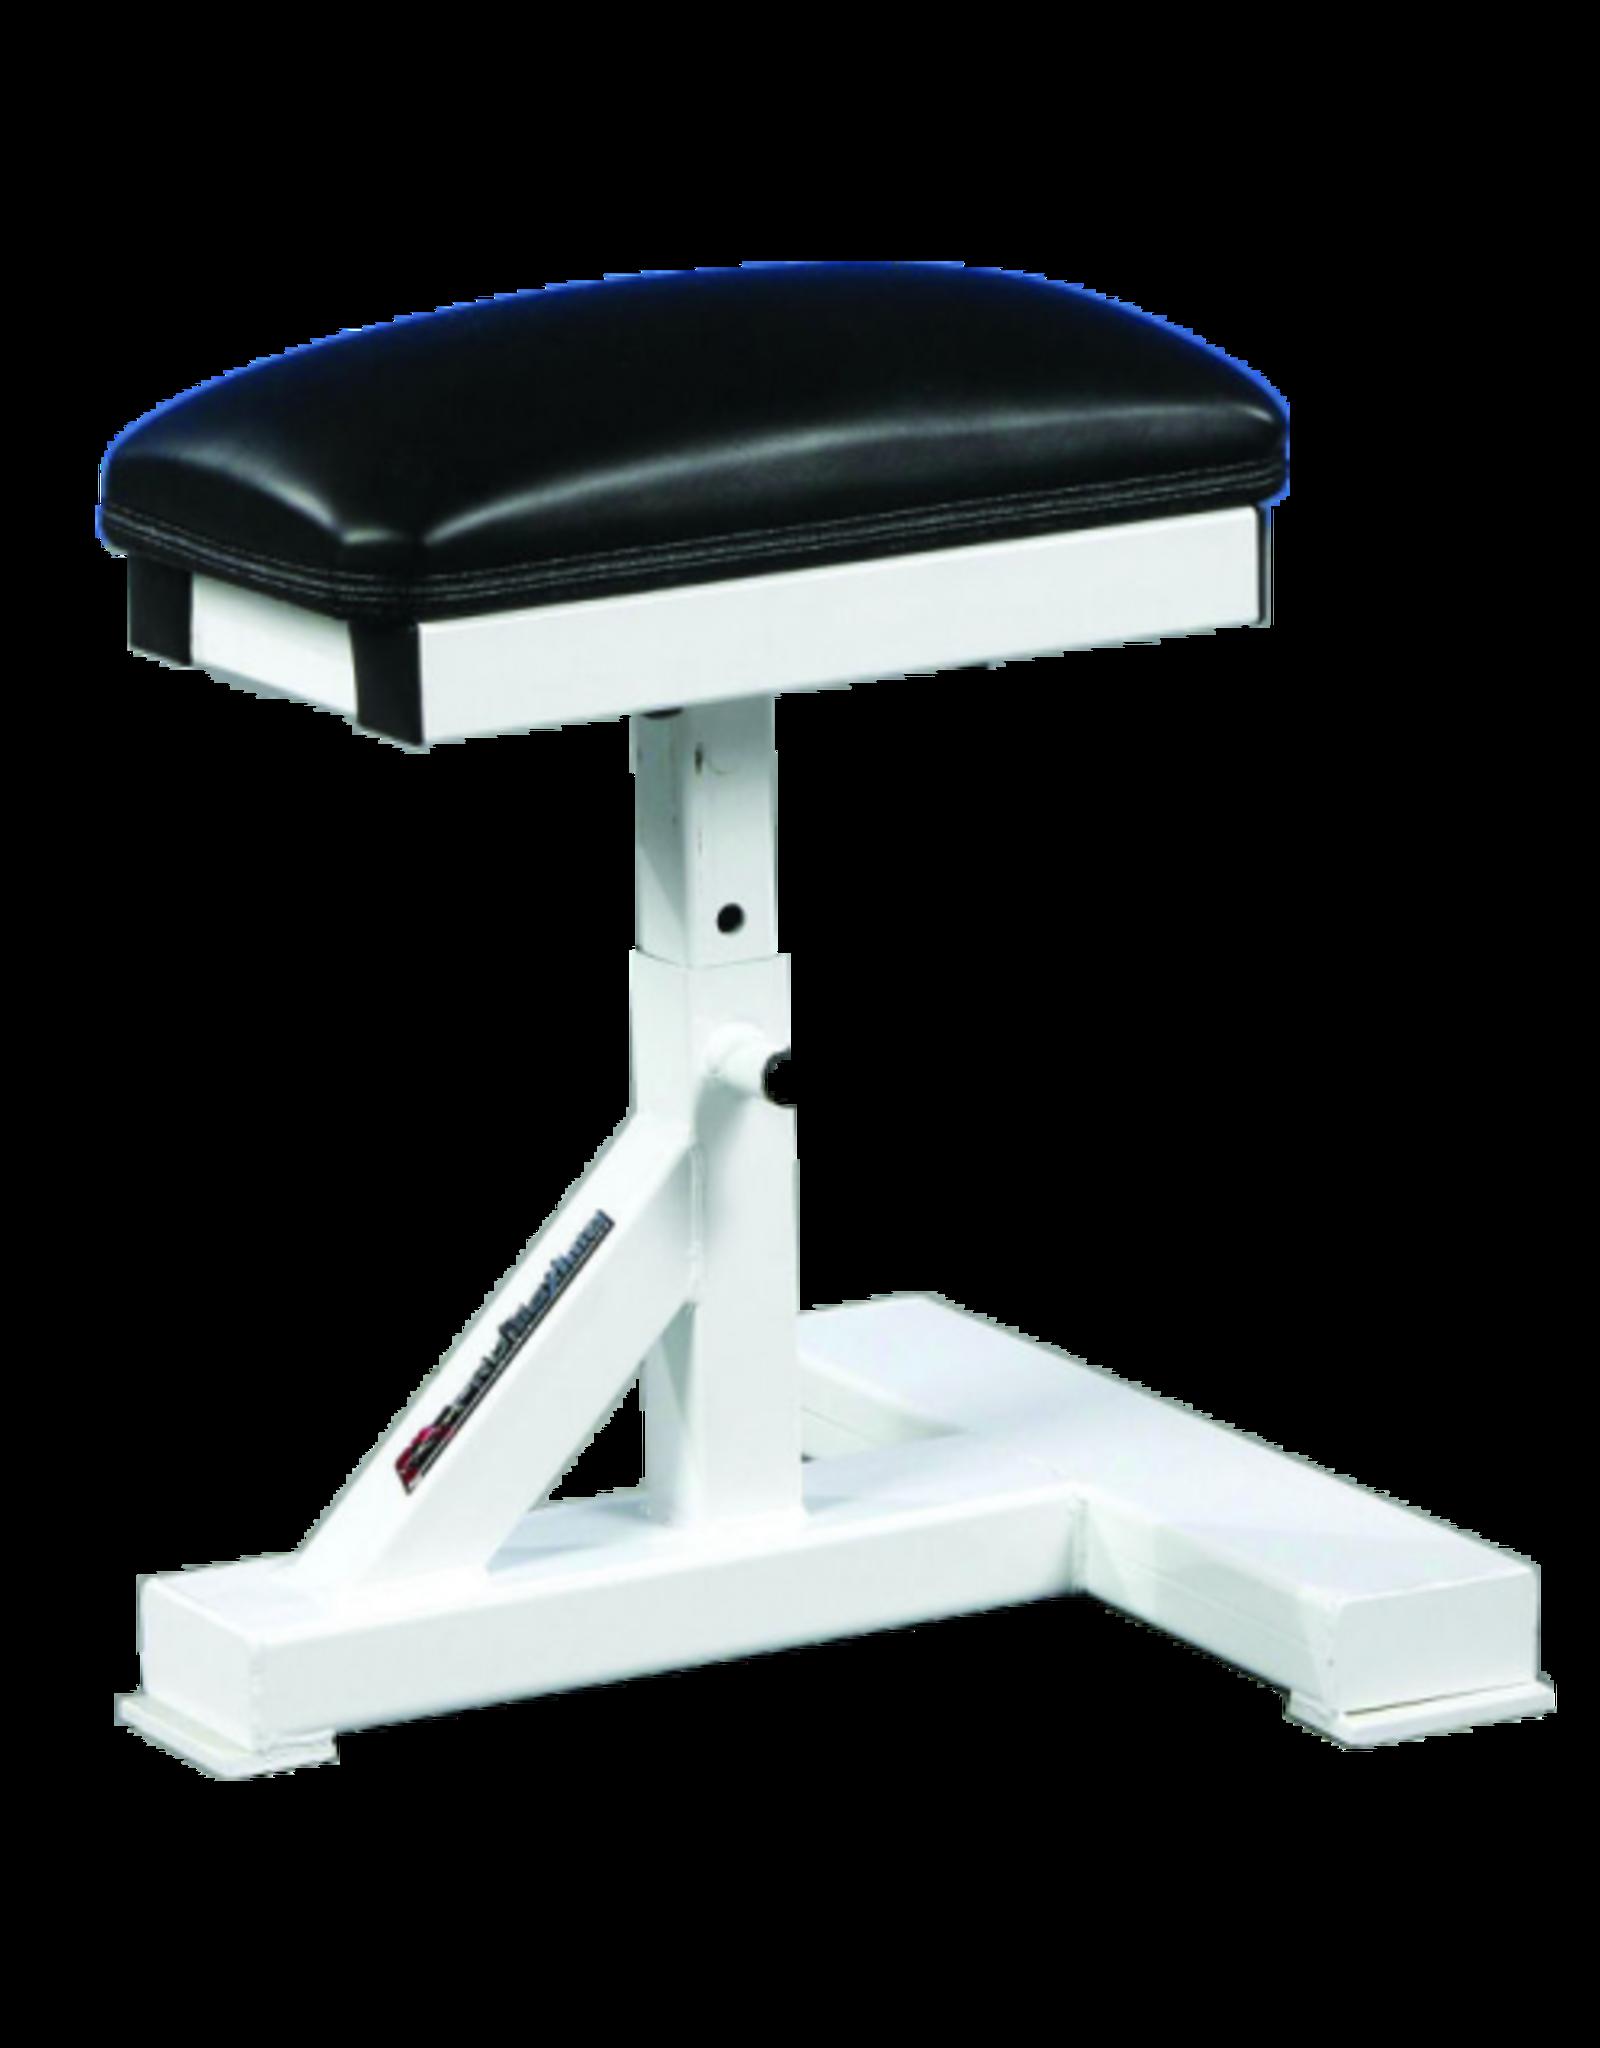 PROMAXIMA PROMAXIMA Adjustable Squat Stool